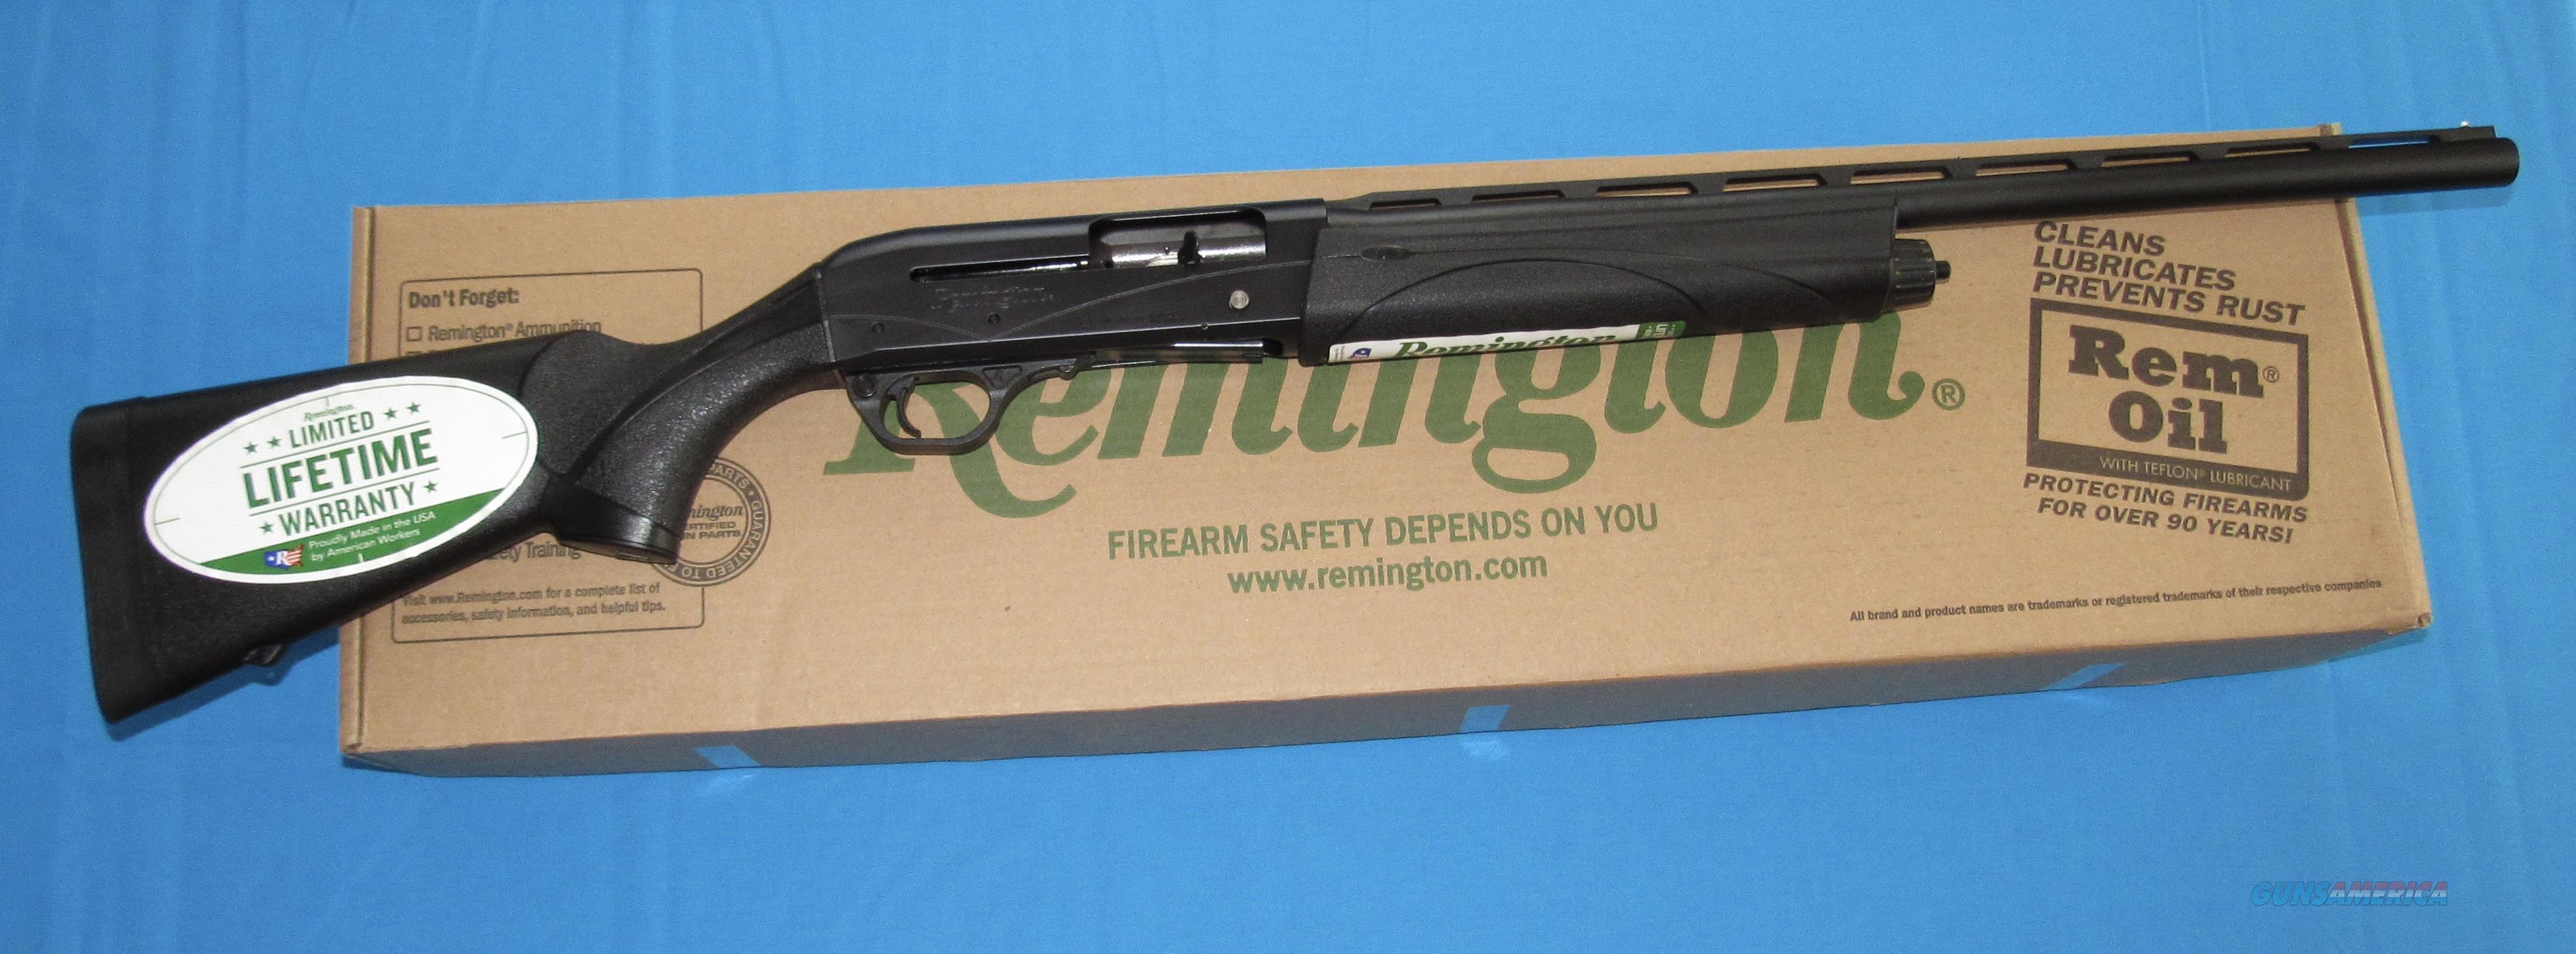 REMINGTON V3 COMPACT 12 GAUGE SEMI-AUTO SHOTGUN  Guns > Shotguns > Remington Shotguns  > Autoloaders > Hunting